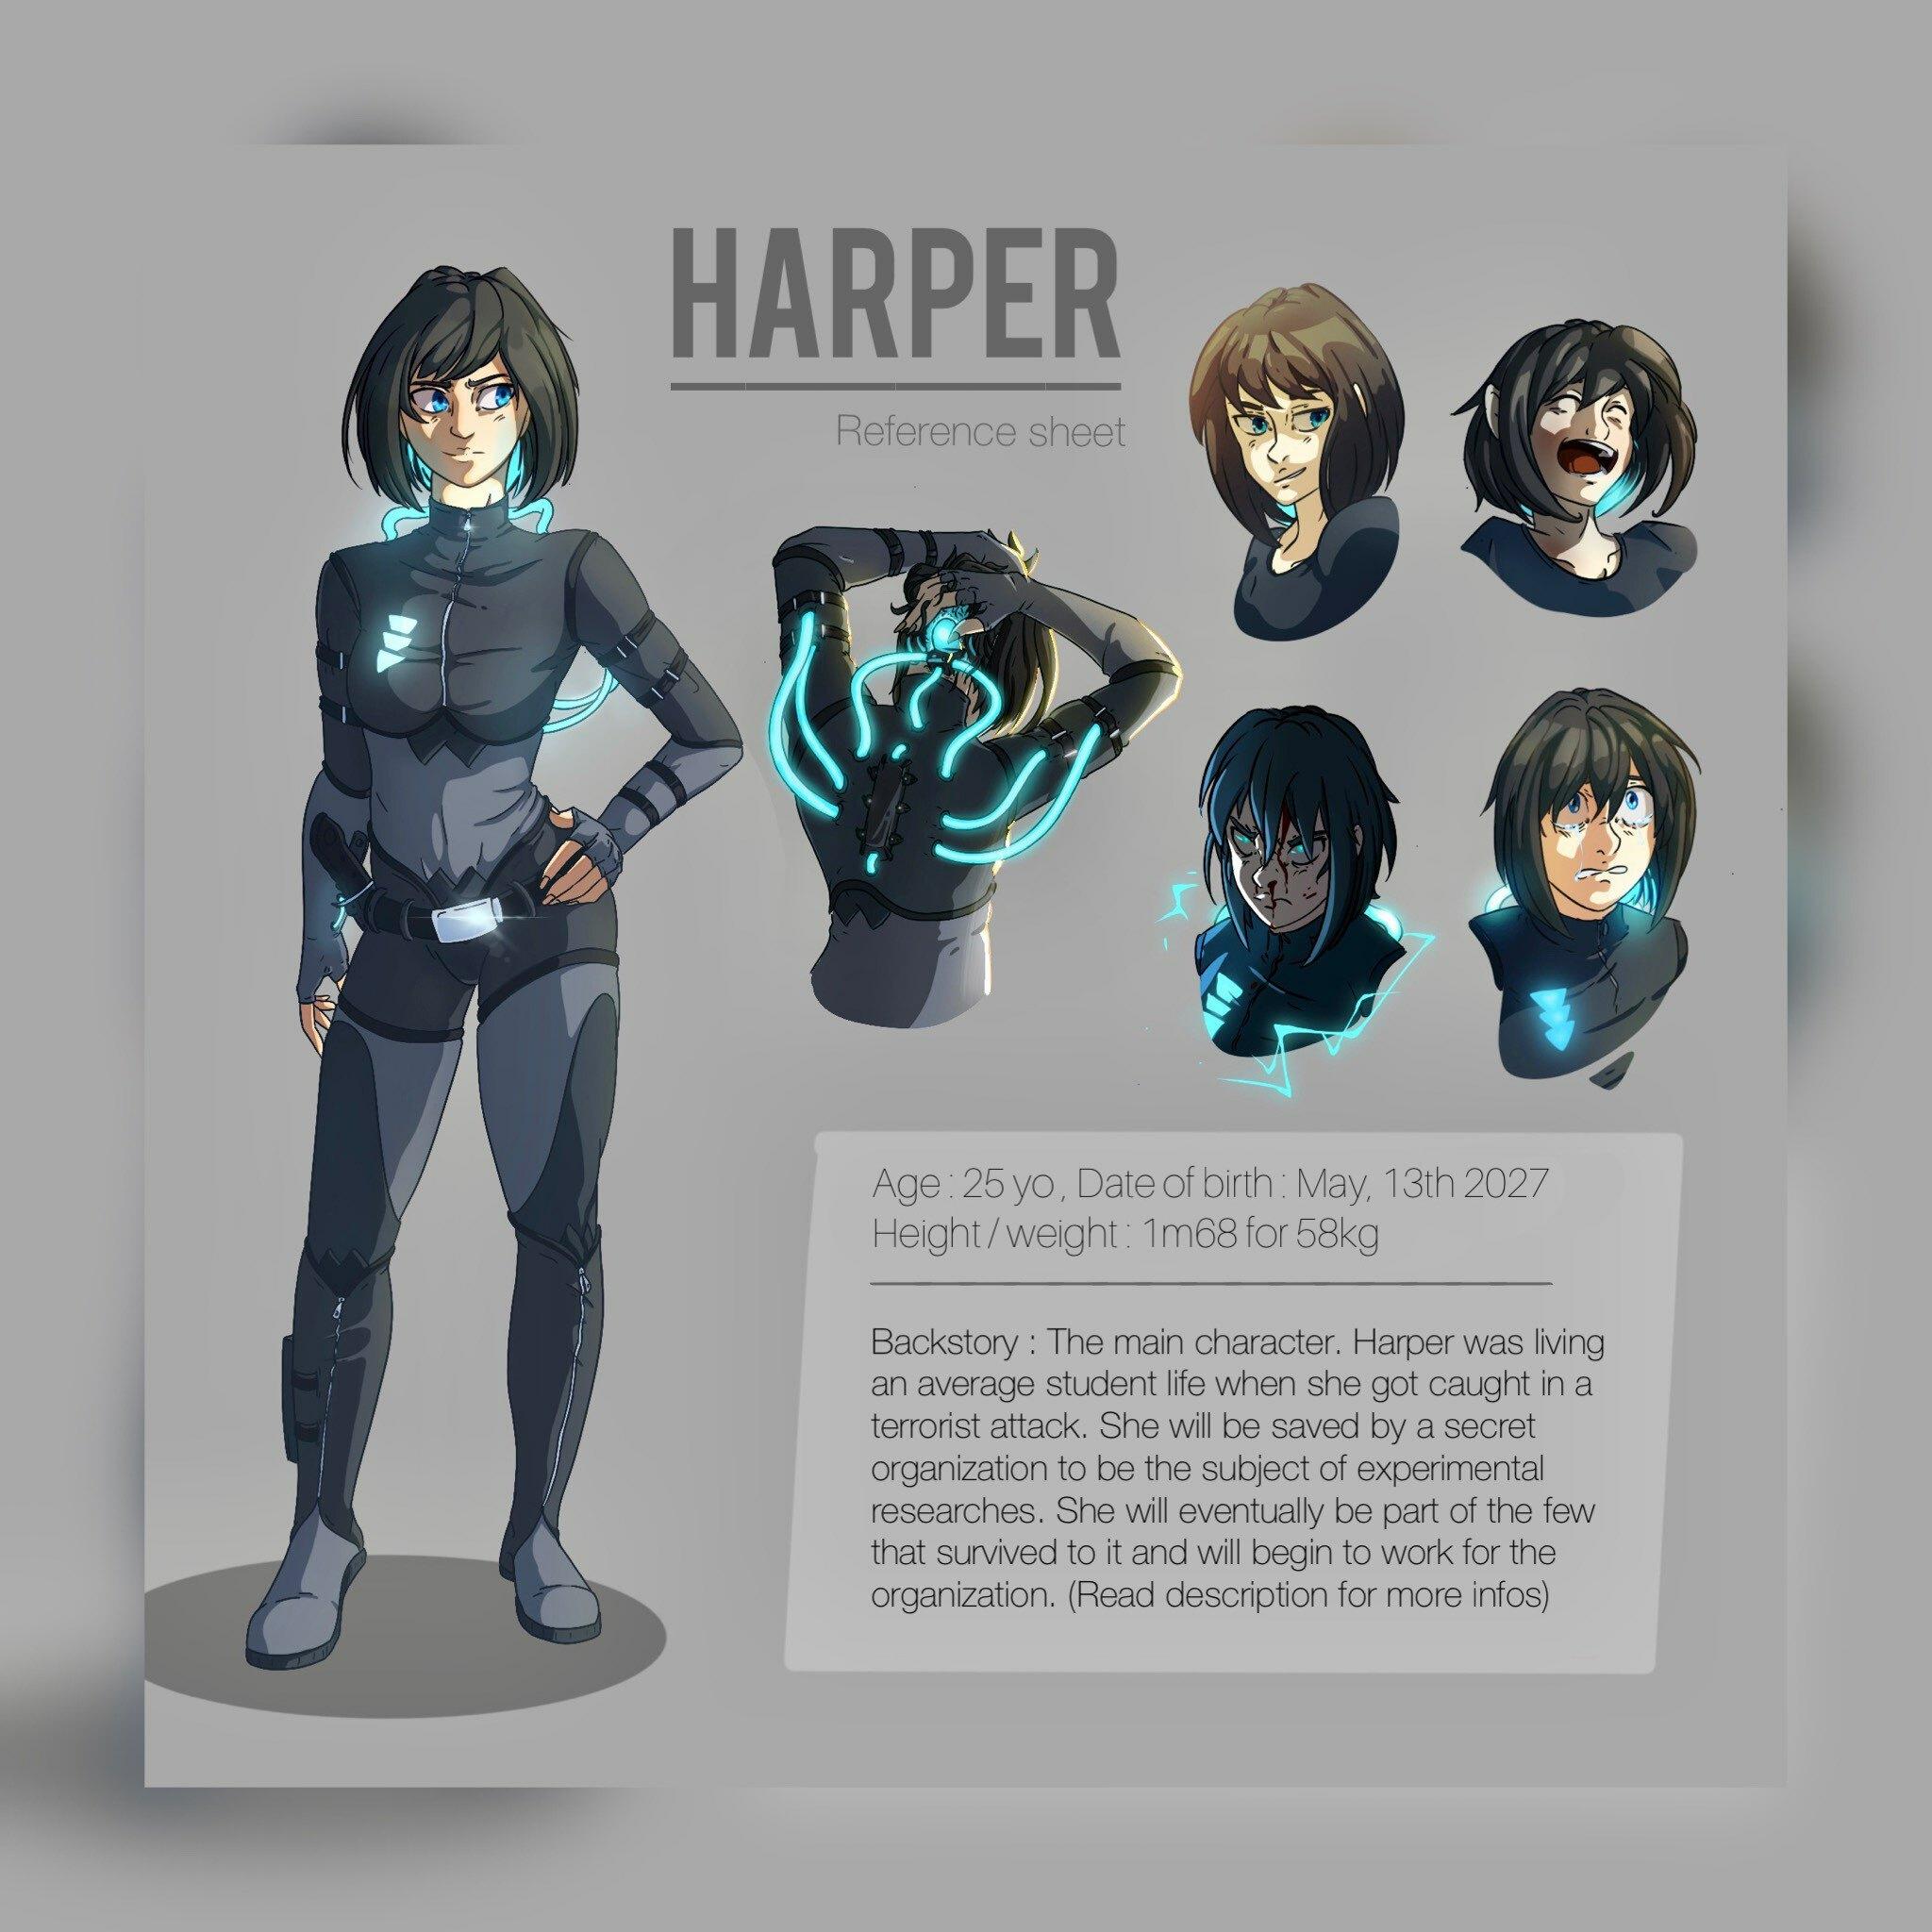 Harper - reference sheet